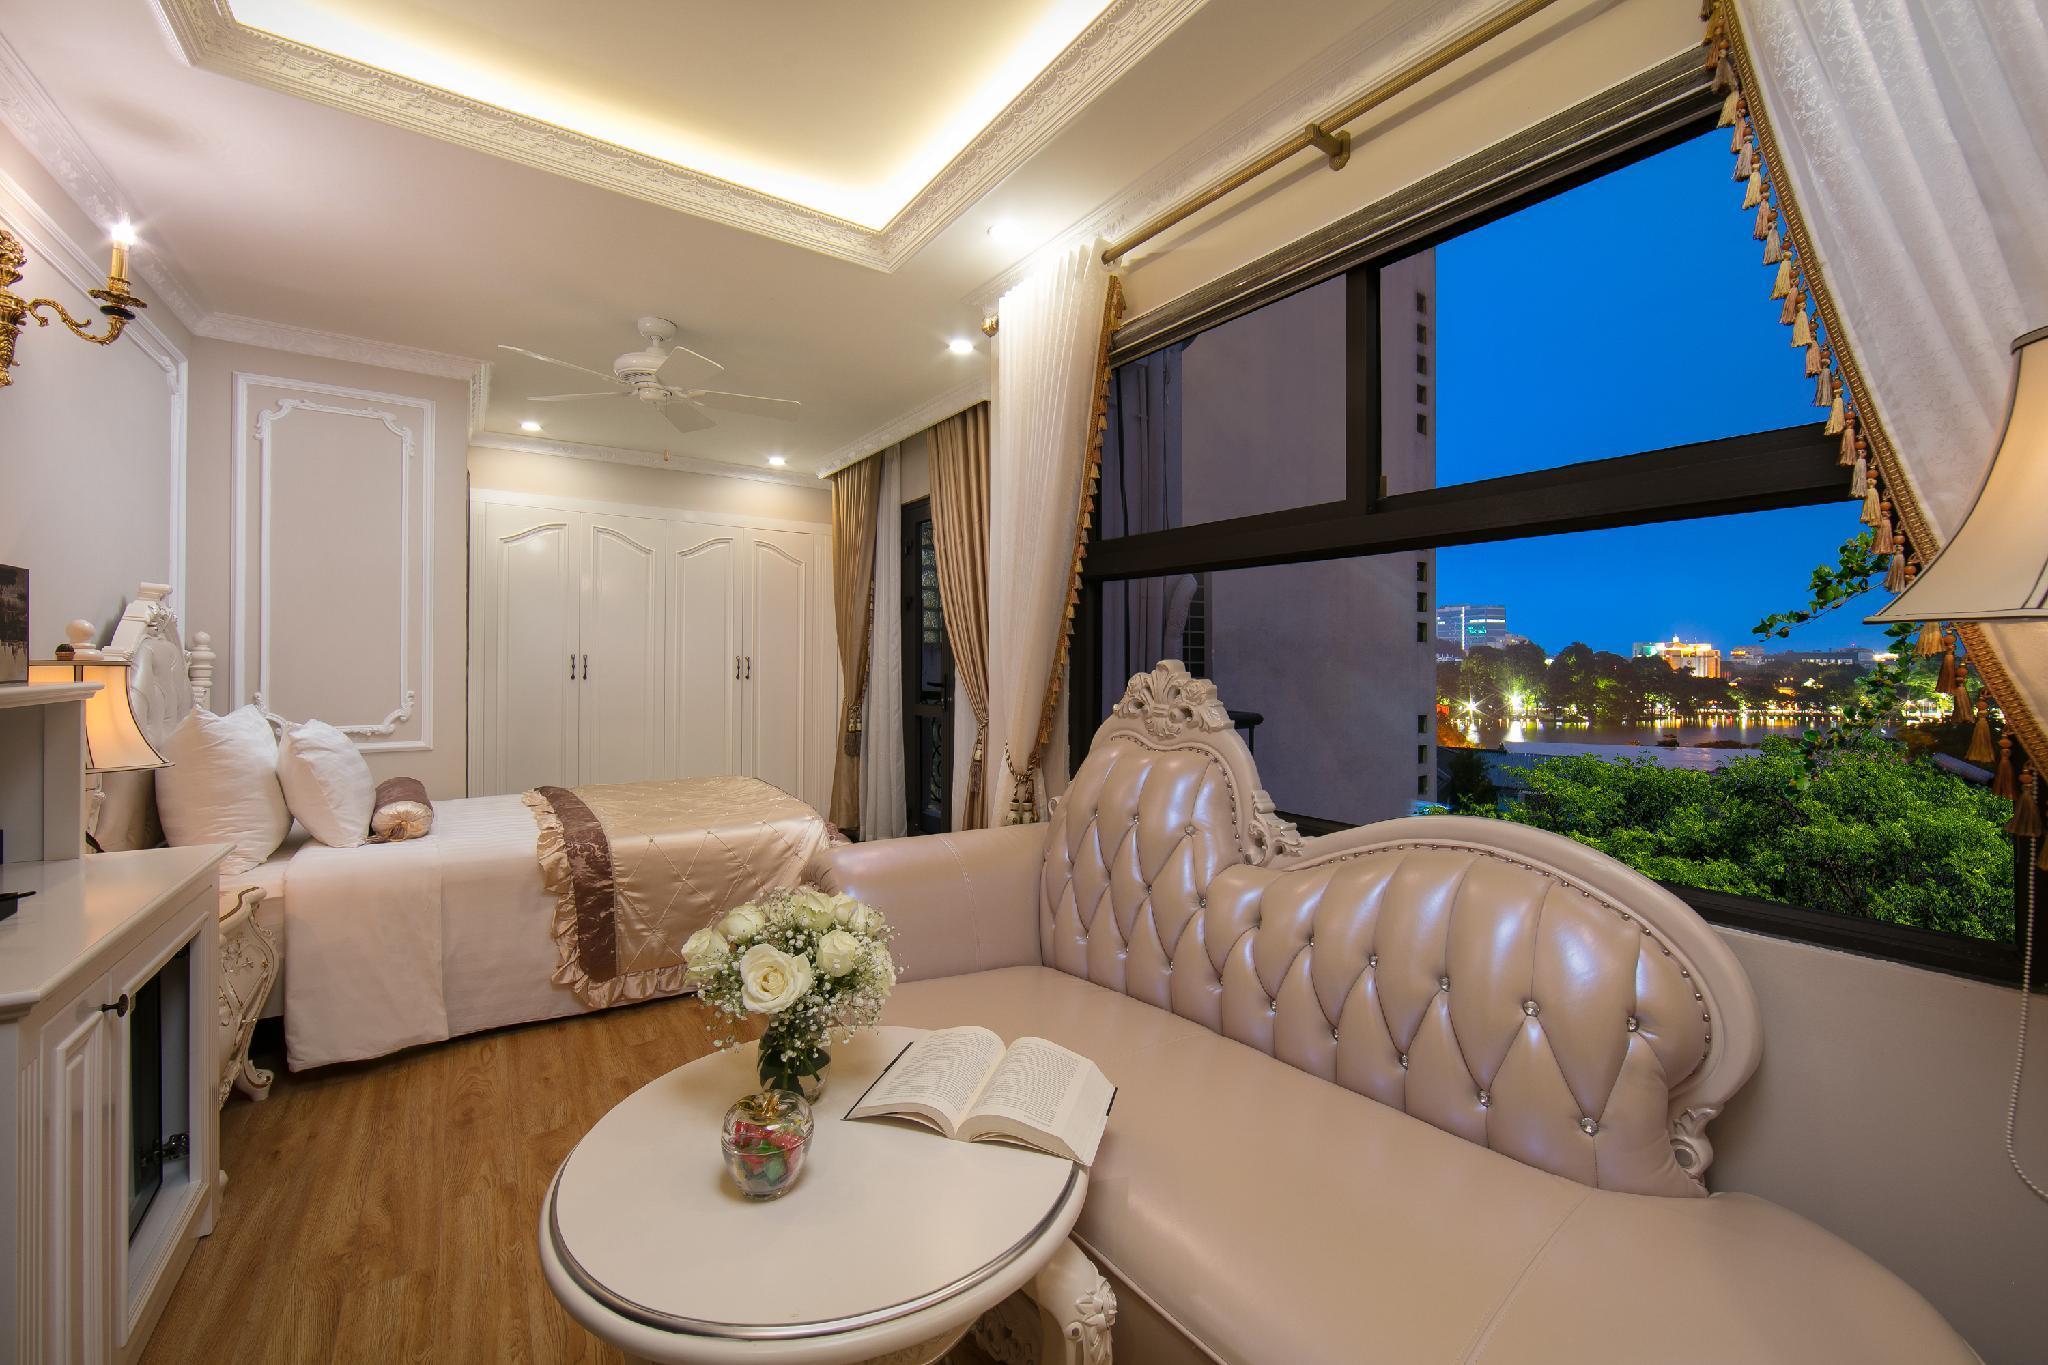 royal holiday hanoi hotel vietnam from 36 save on agoda rh agoda com